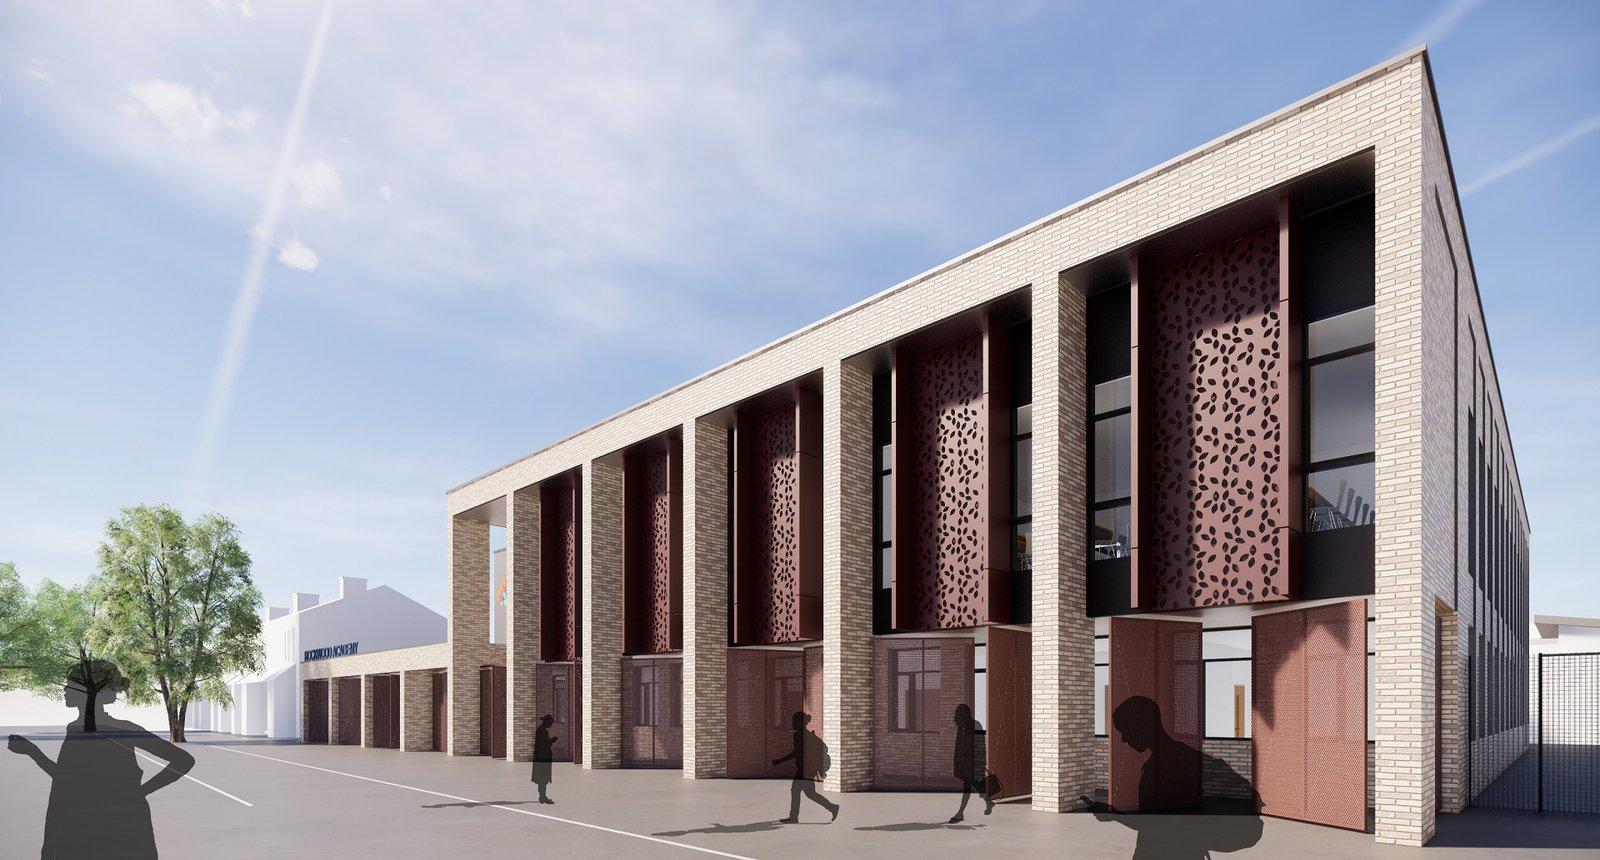 Image of the proposed Rockwood Academy School in Birmingham